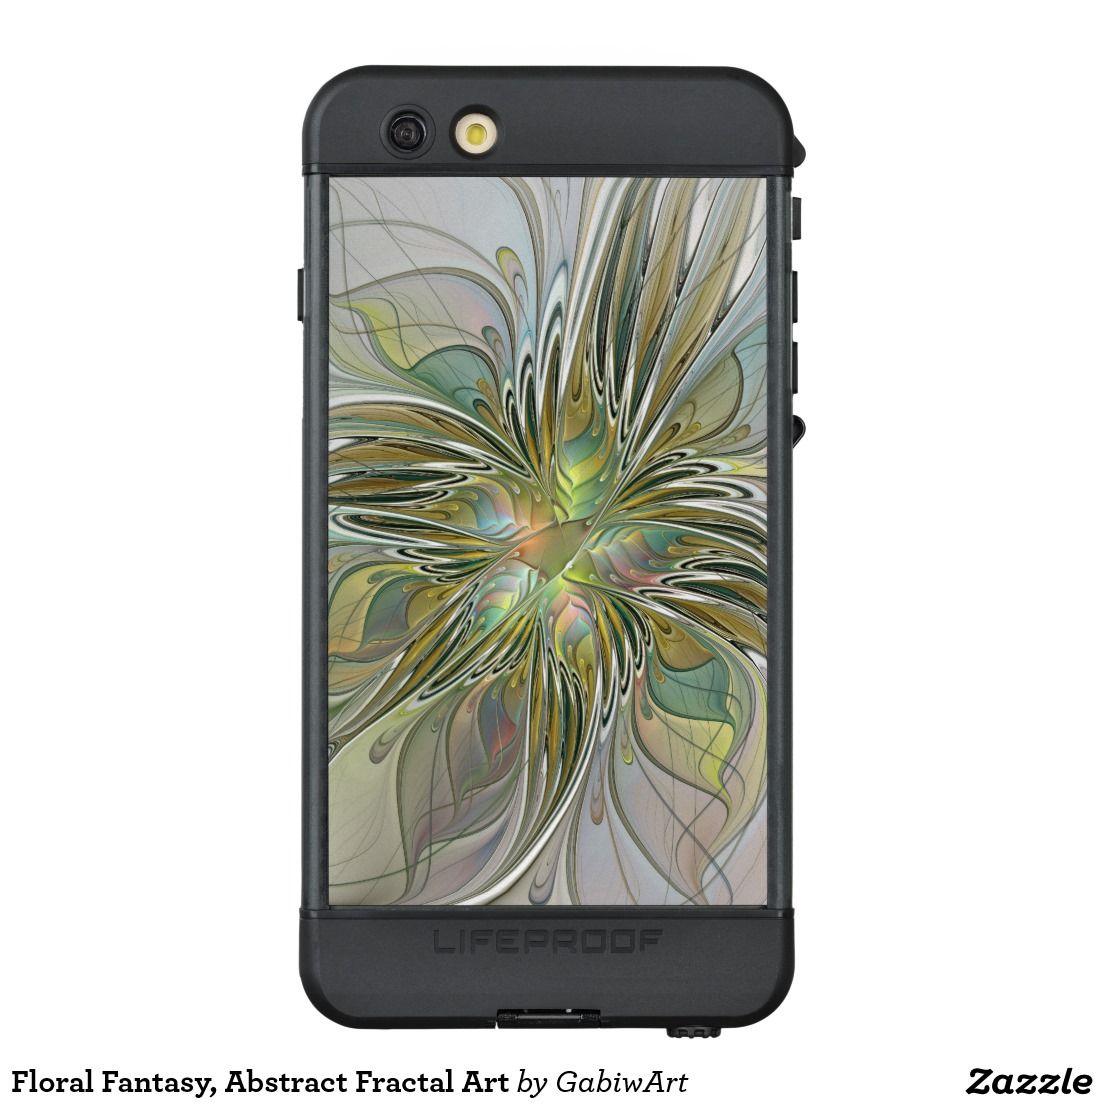 Floral Fantasy, Abstract Fractal Art LifeProof® NÜÜD® iPhone 6s Plus Case